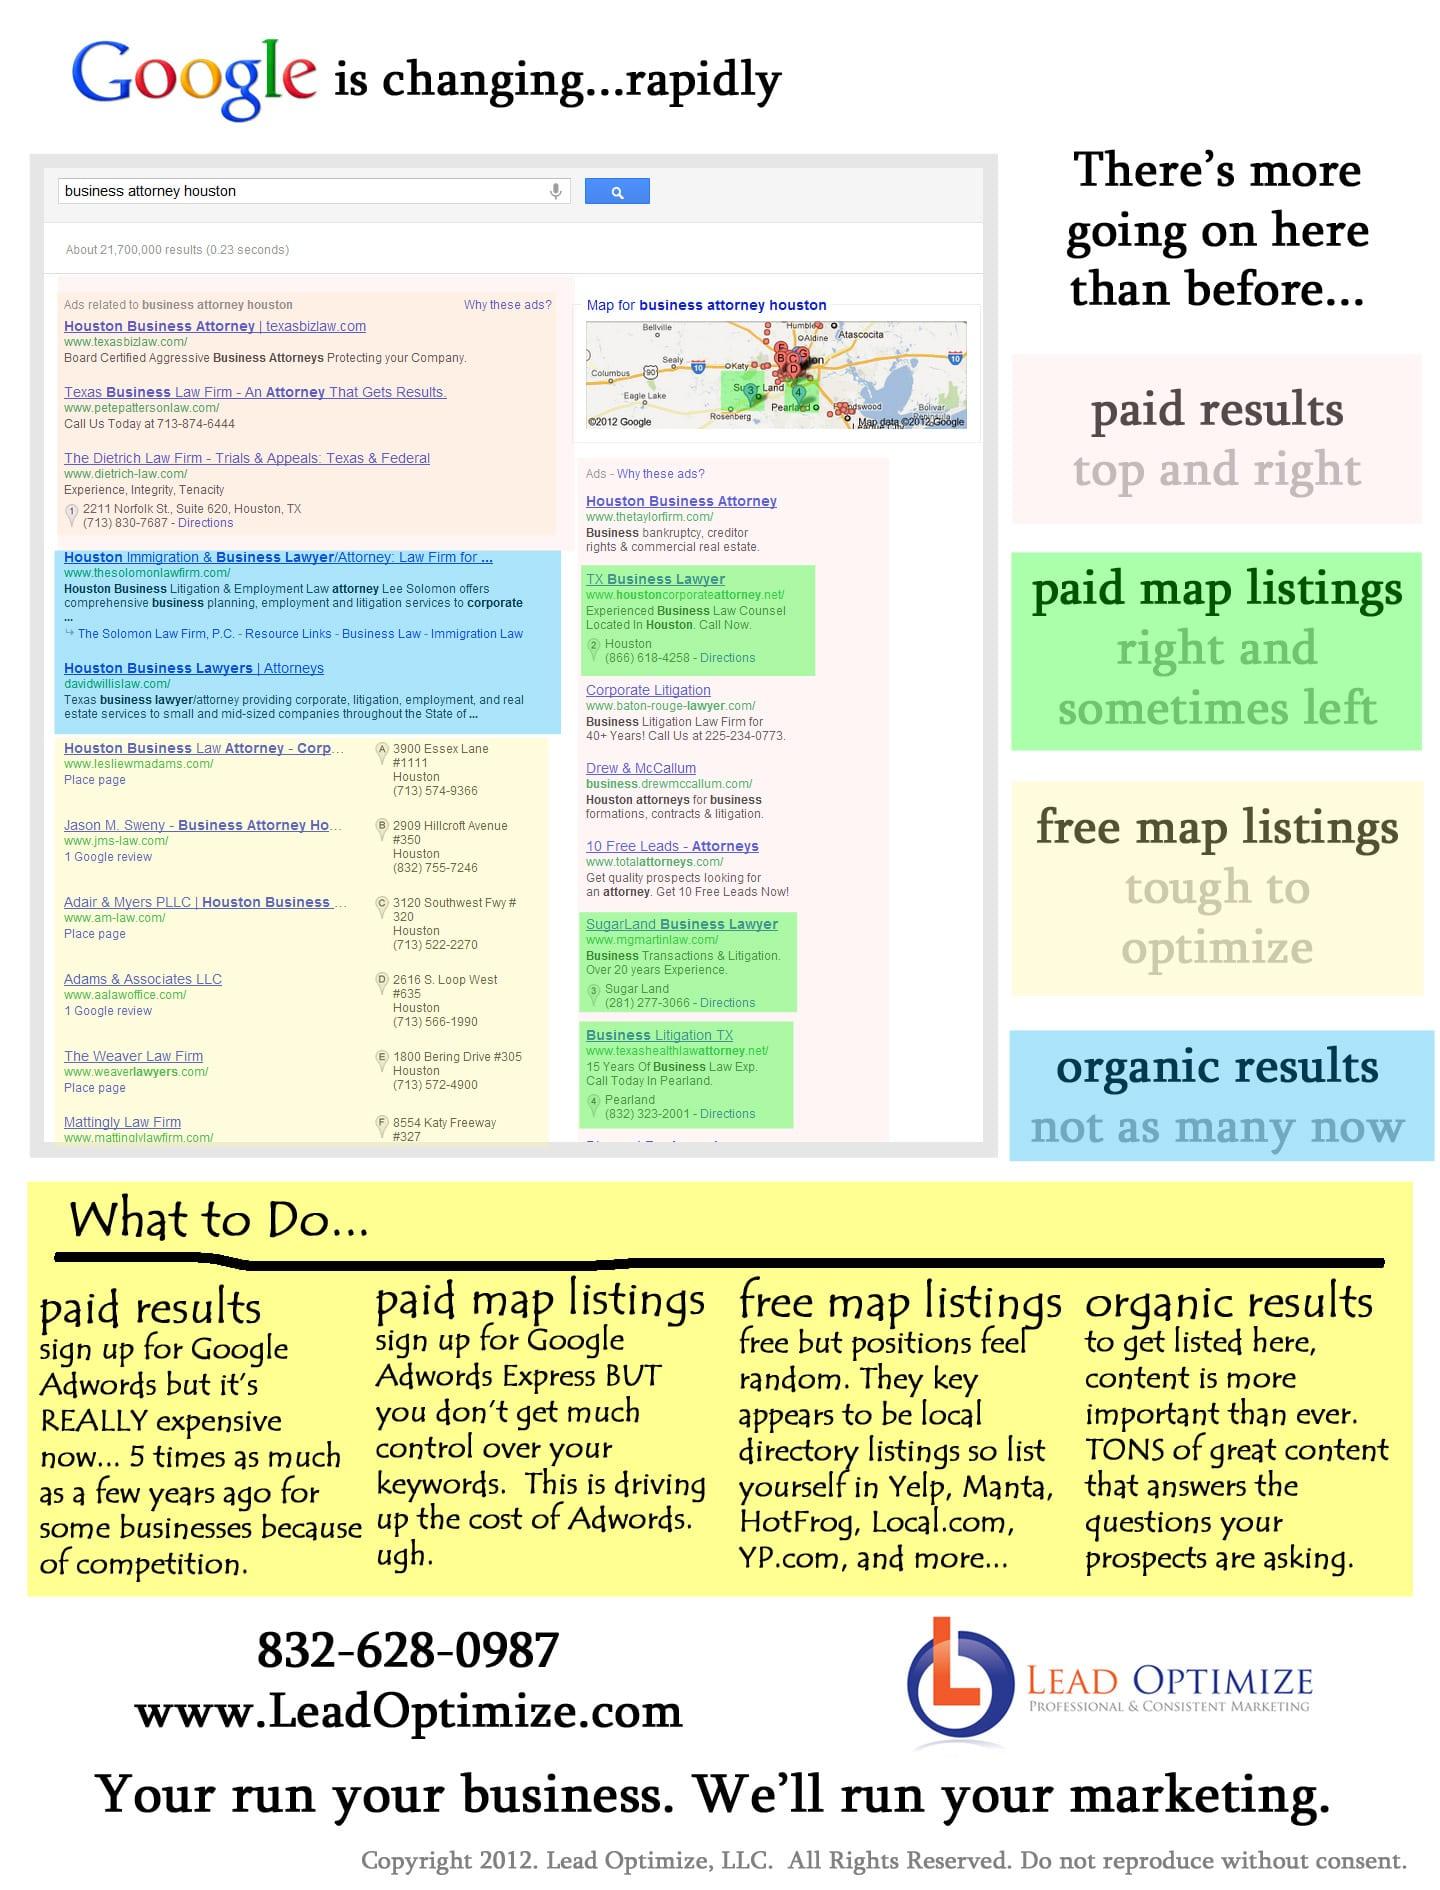 Google Presentation, Changes to Google